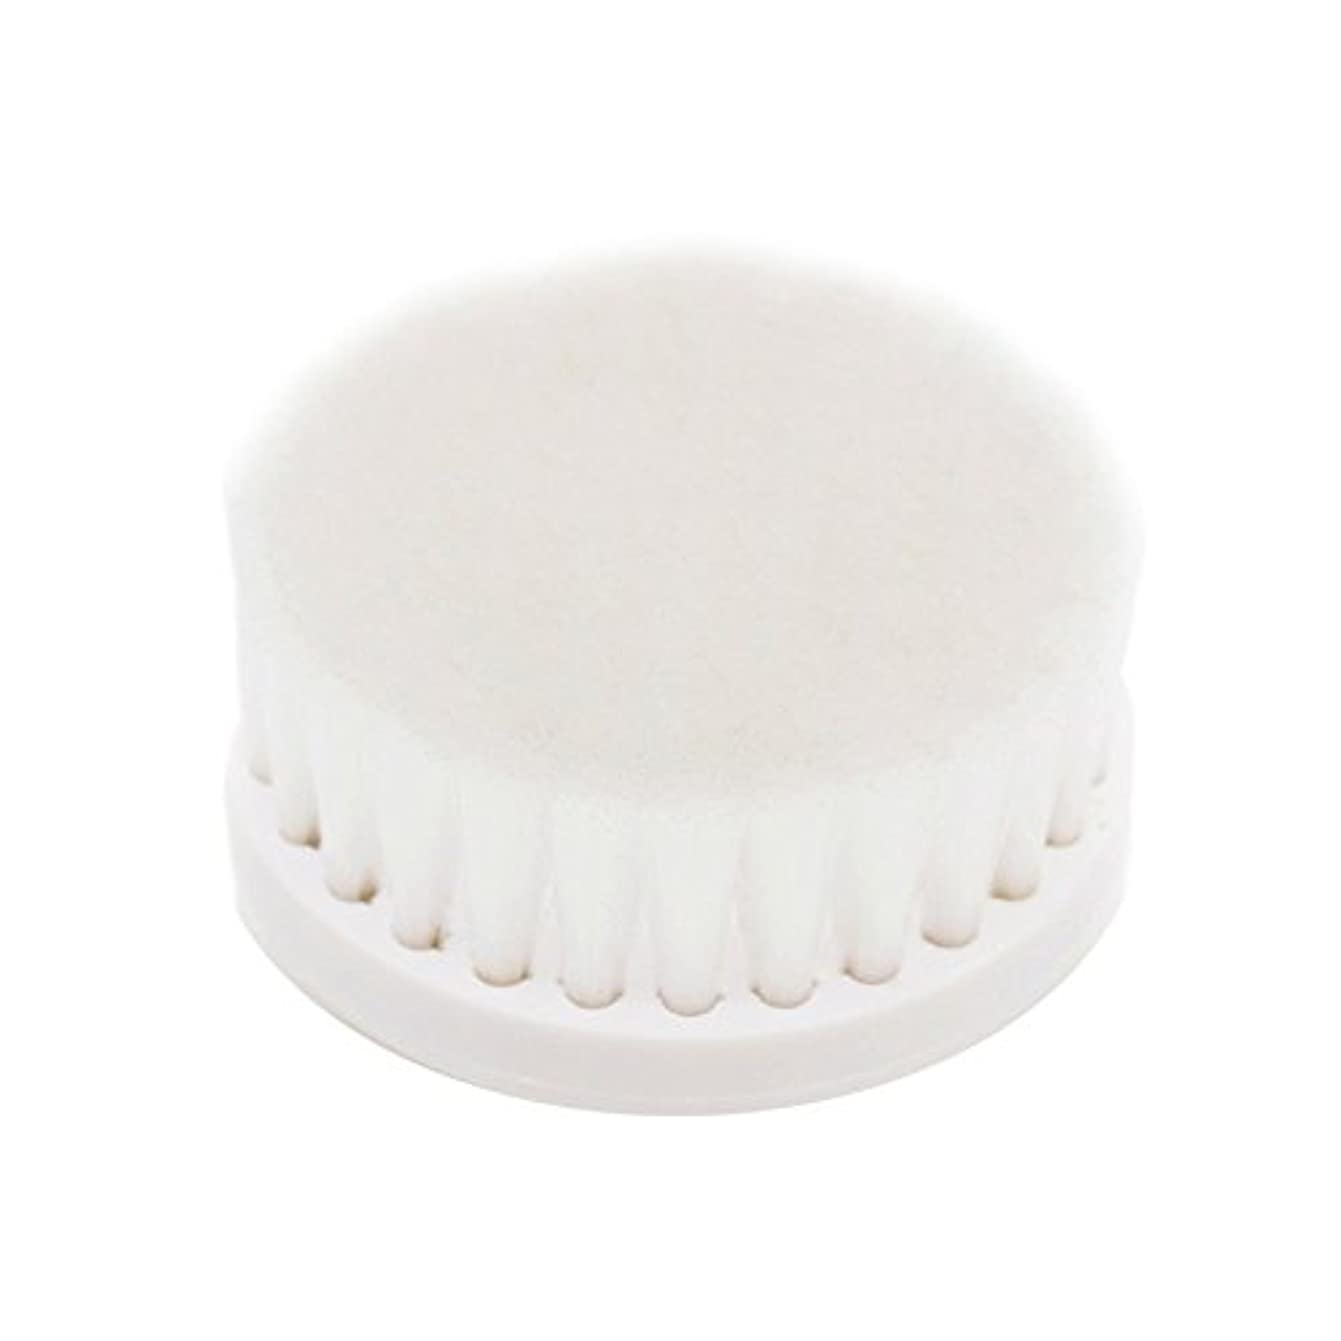 Areti【日本公式販売品】アレティ 洗顔ブラシ 専用 アタッチメント A 顔用ソフトブラシ